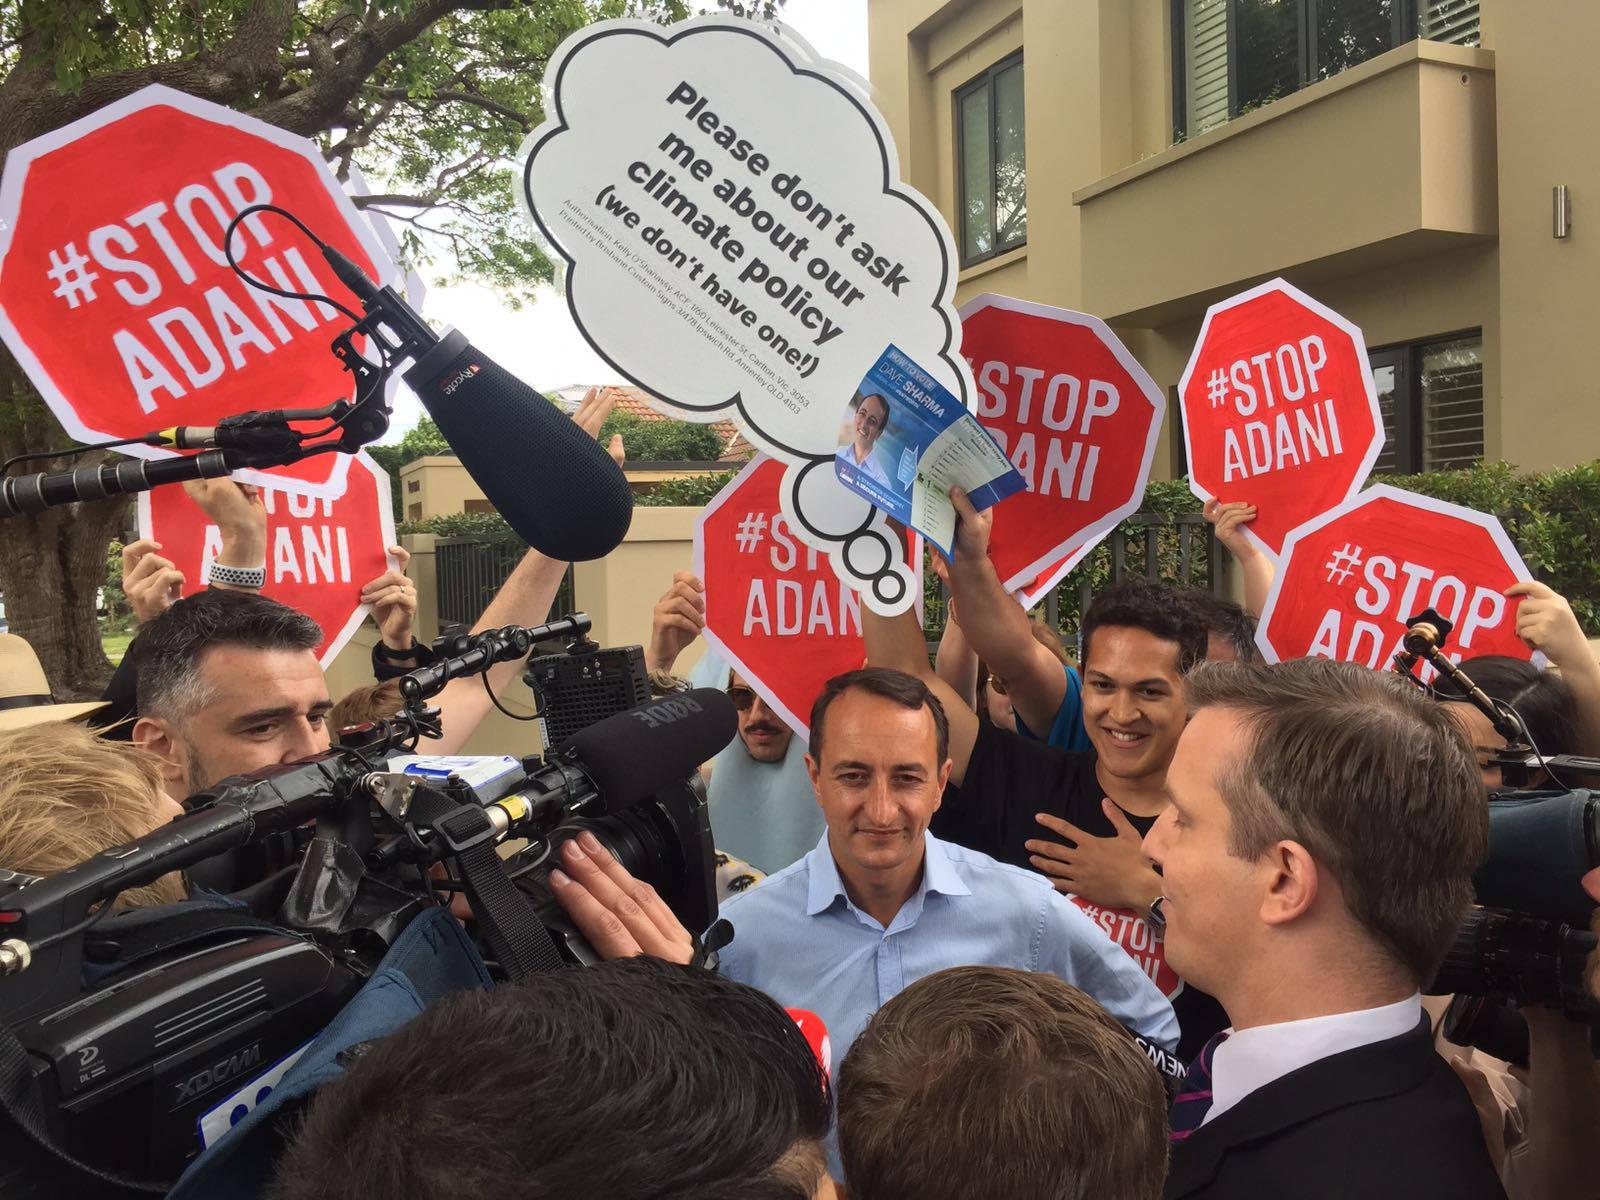 Wentworth votes to #StopAdani